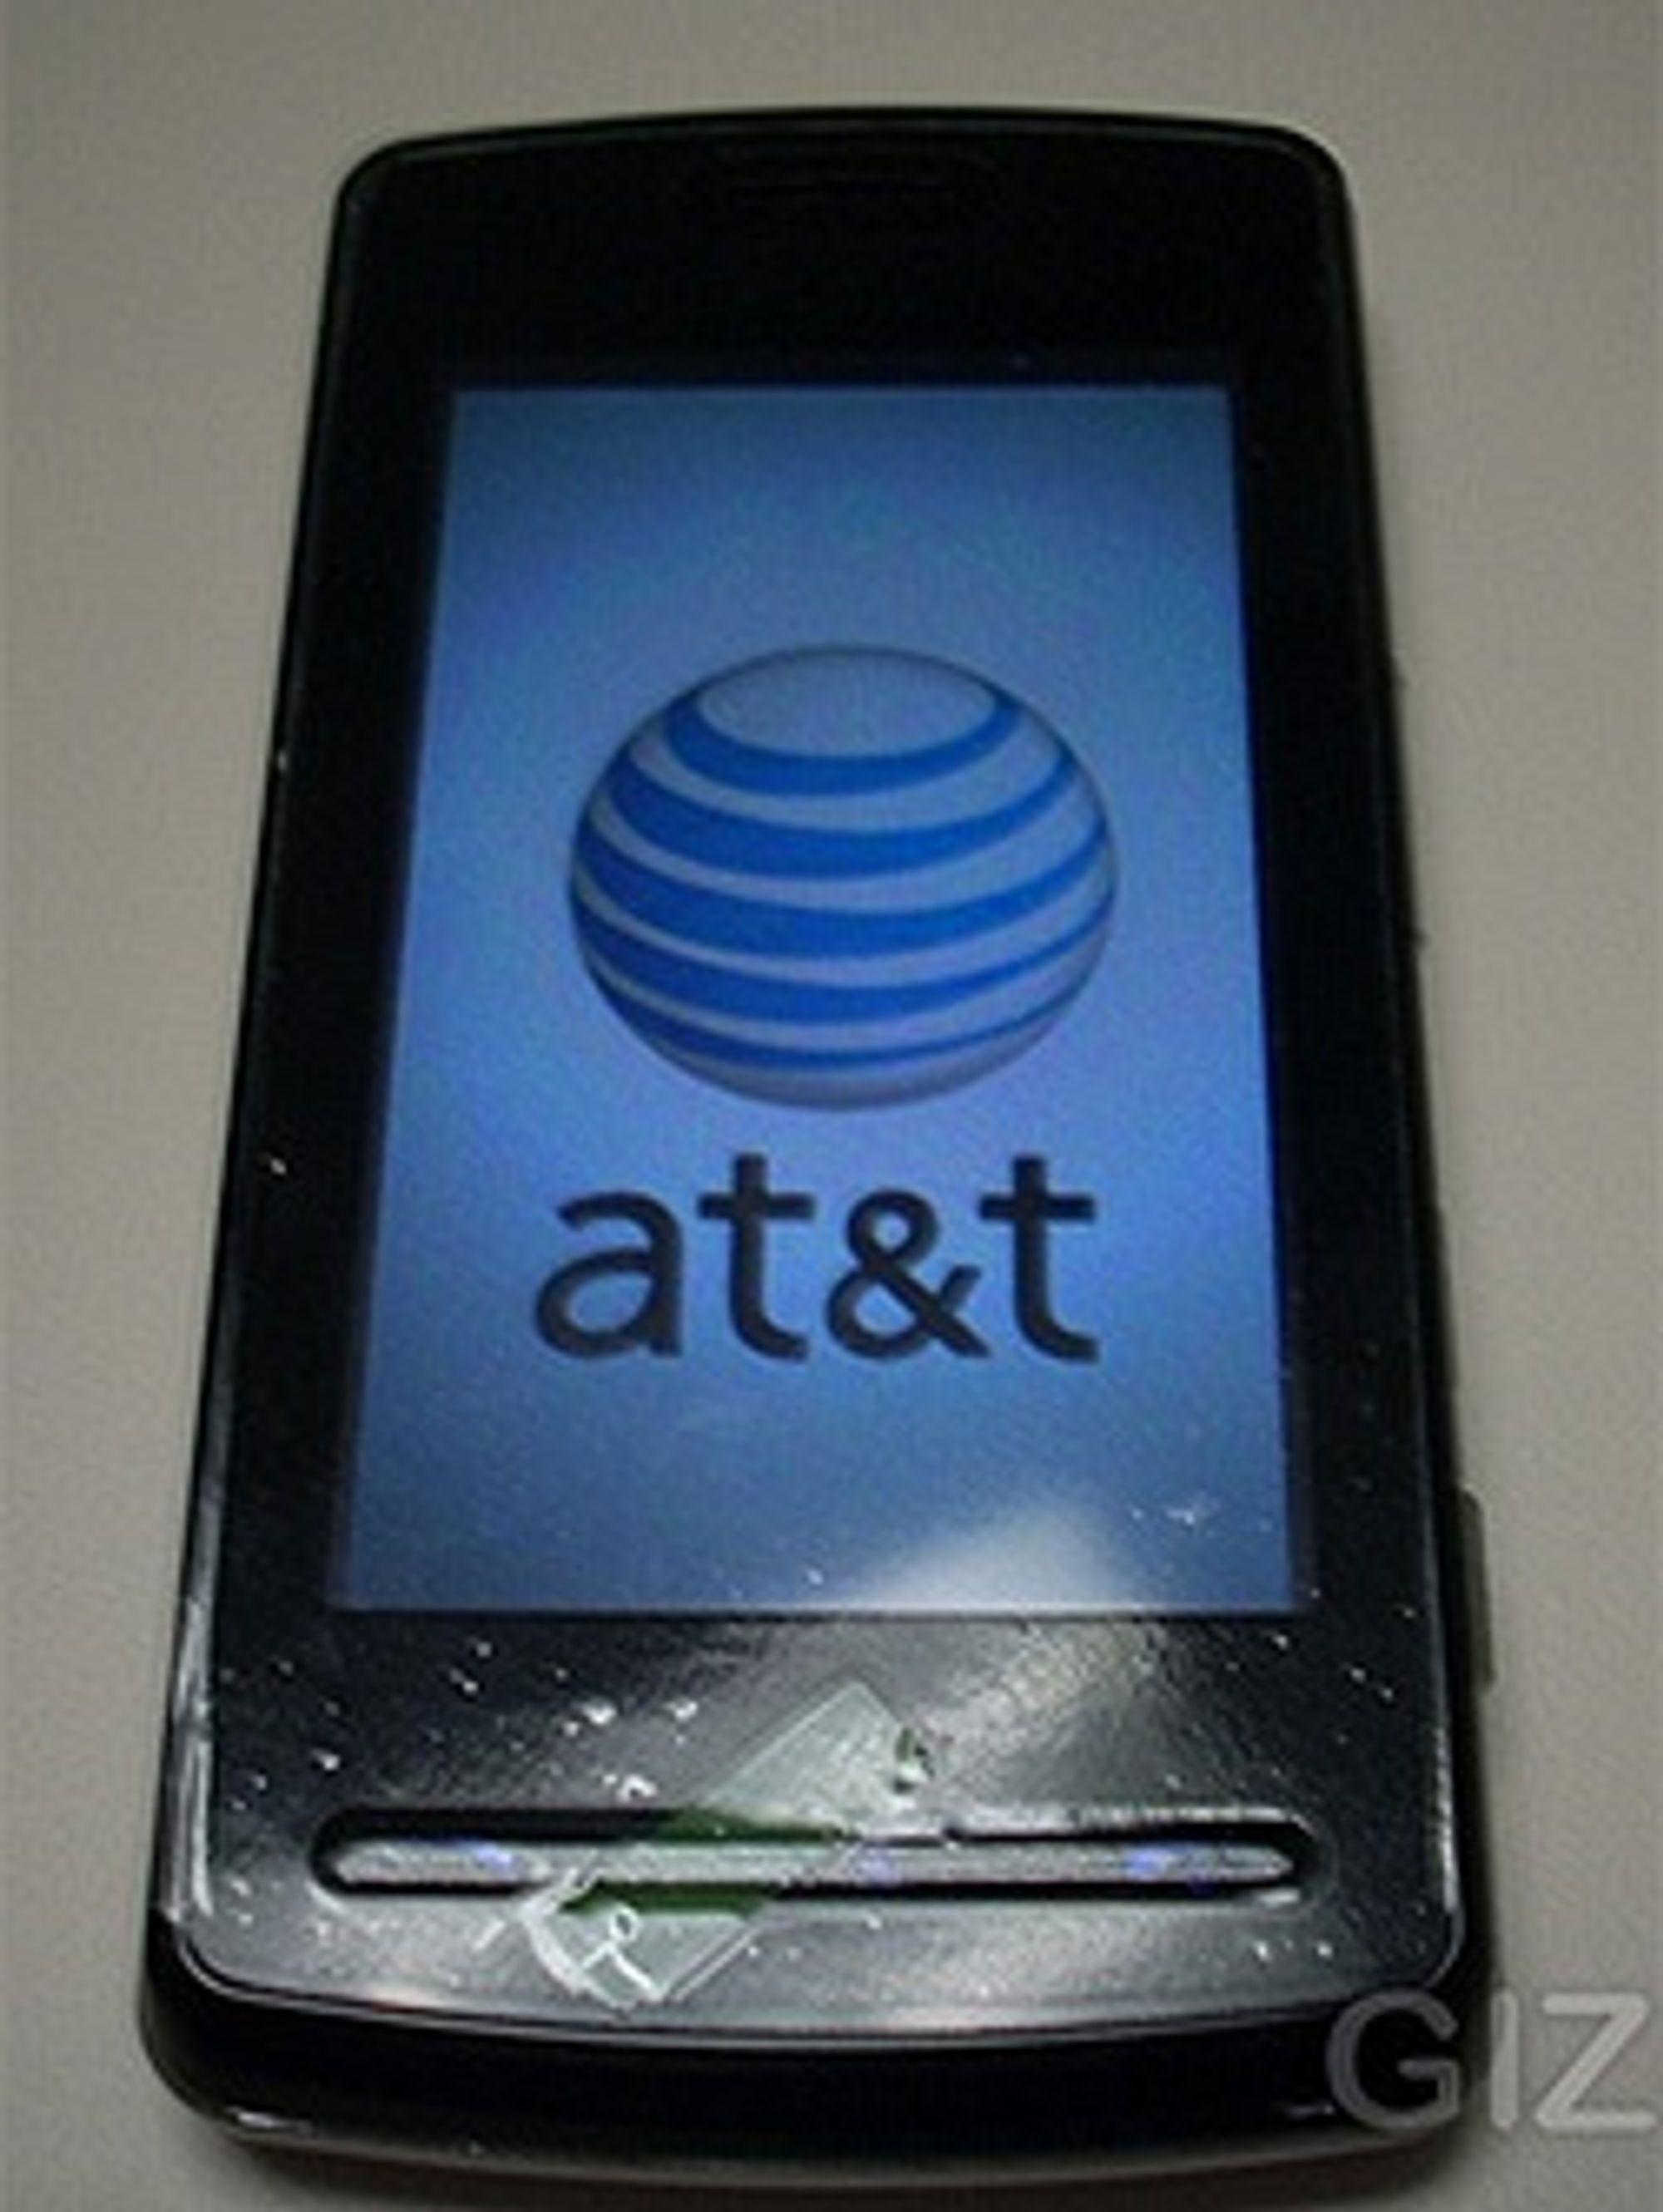 LGs nye Prada-telefon? (Foto: Gizmodo)